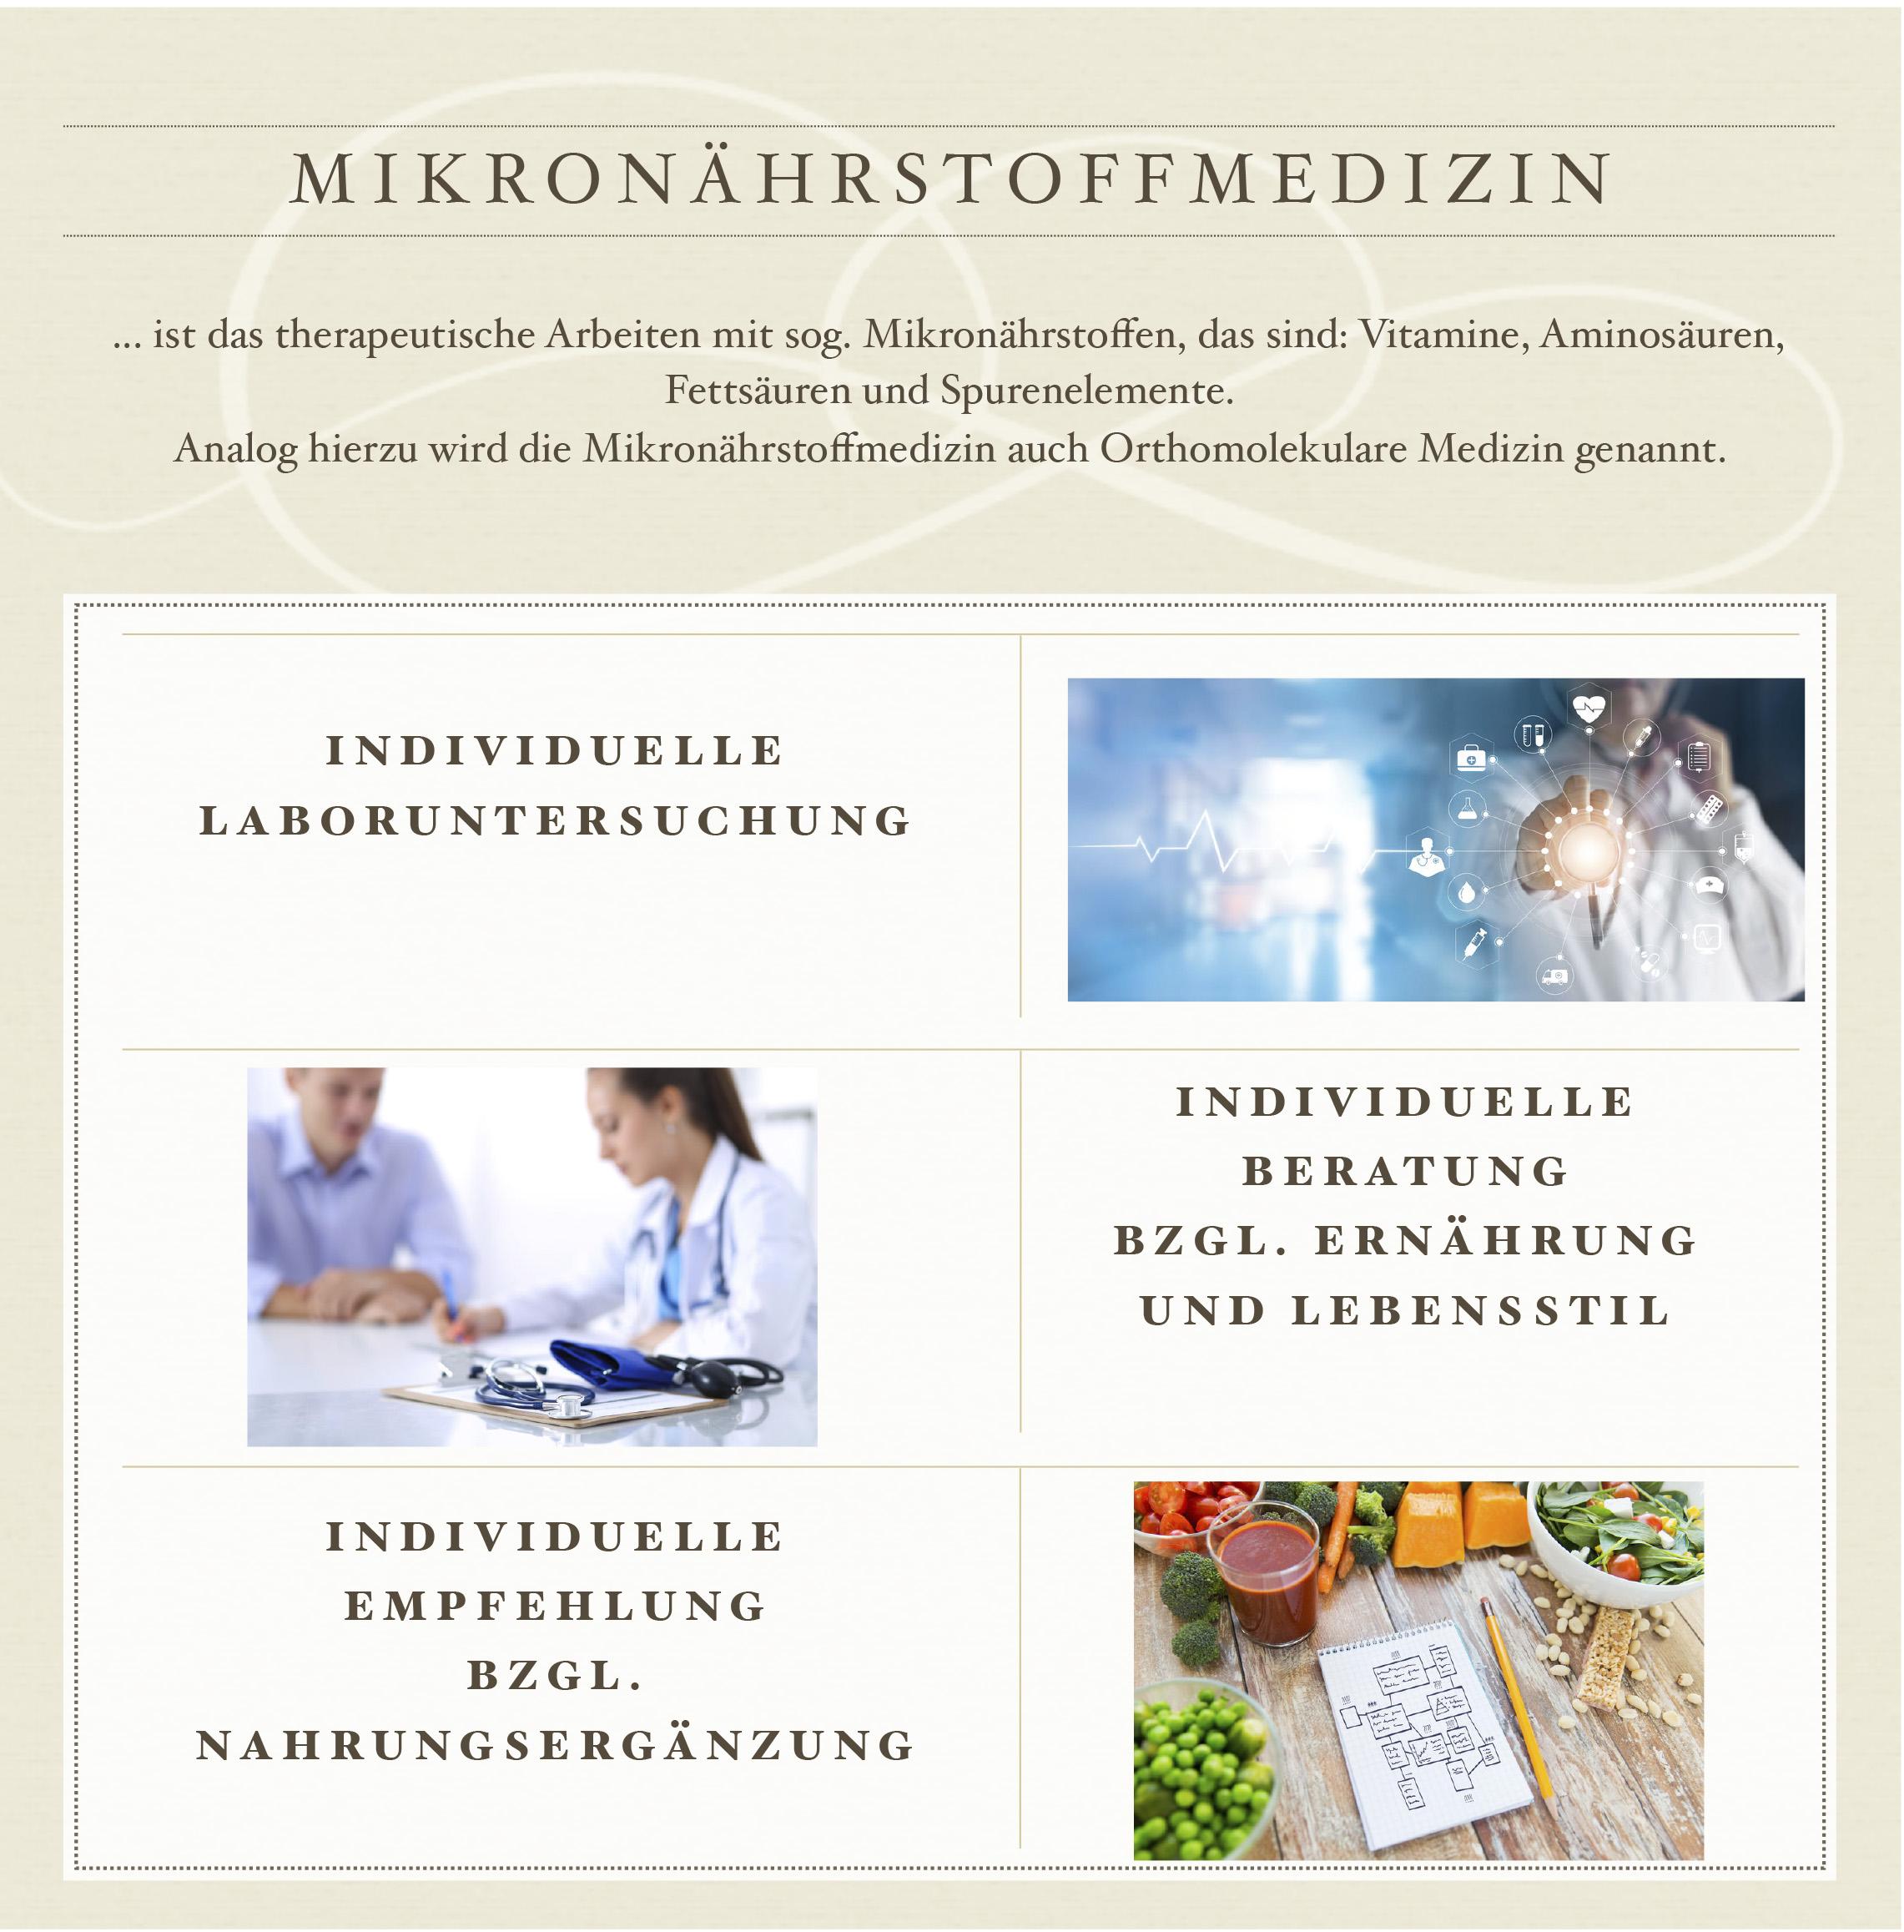 Flyerausschnitt: Mikronährstoffmedizin Dr. Melanie Schmidt